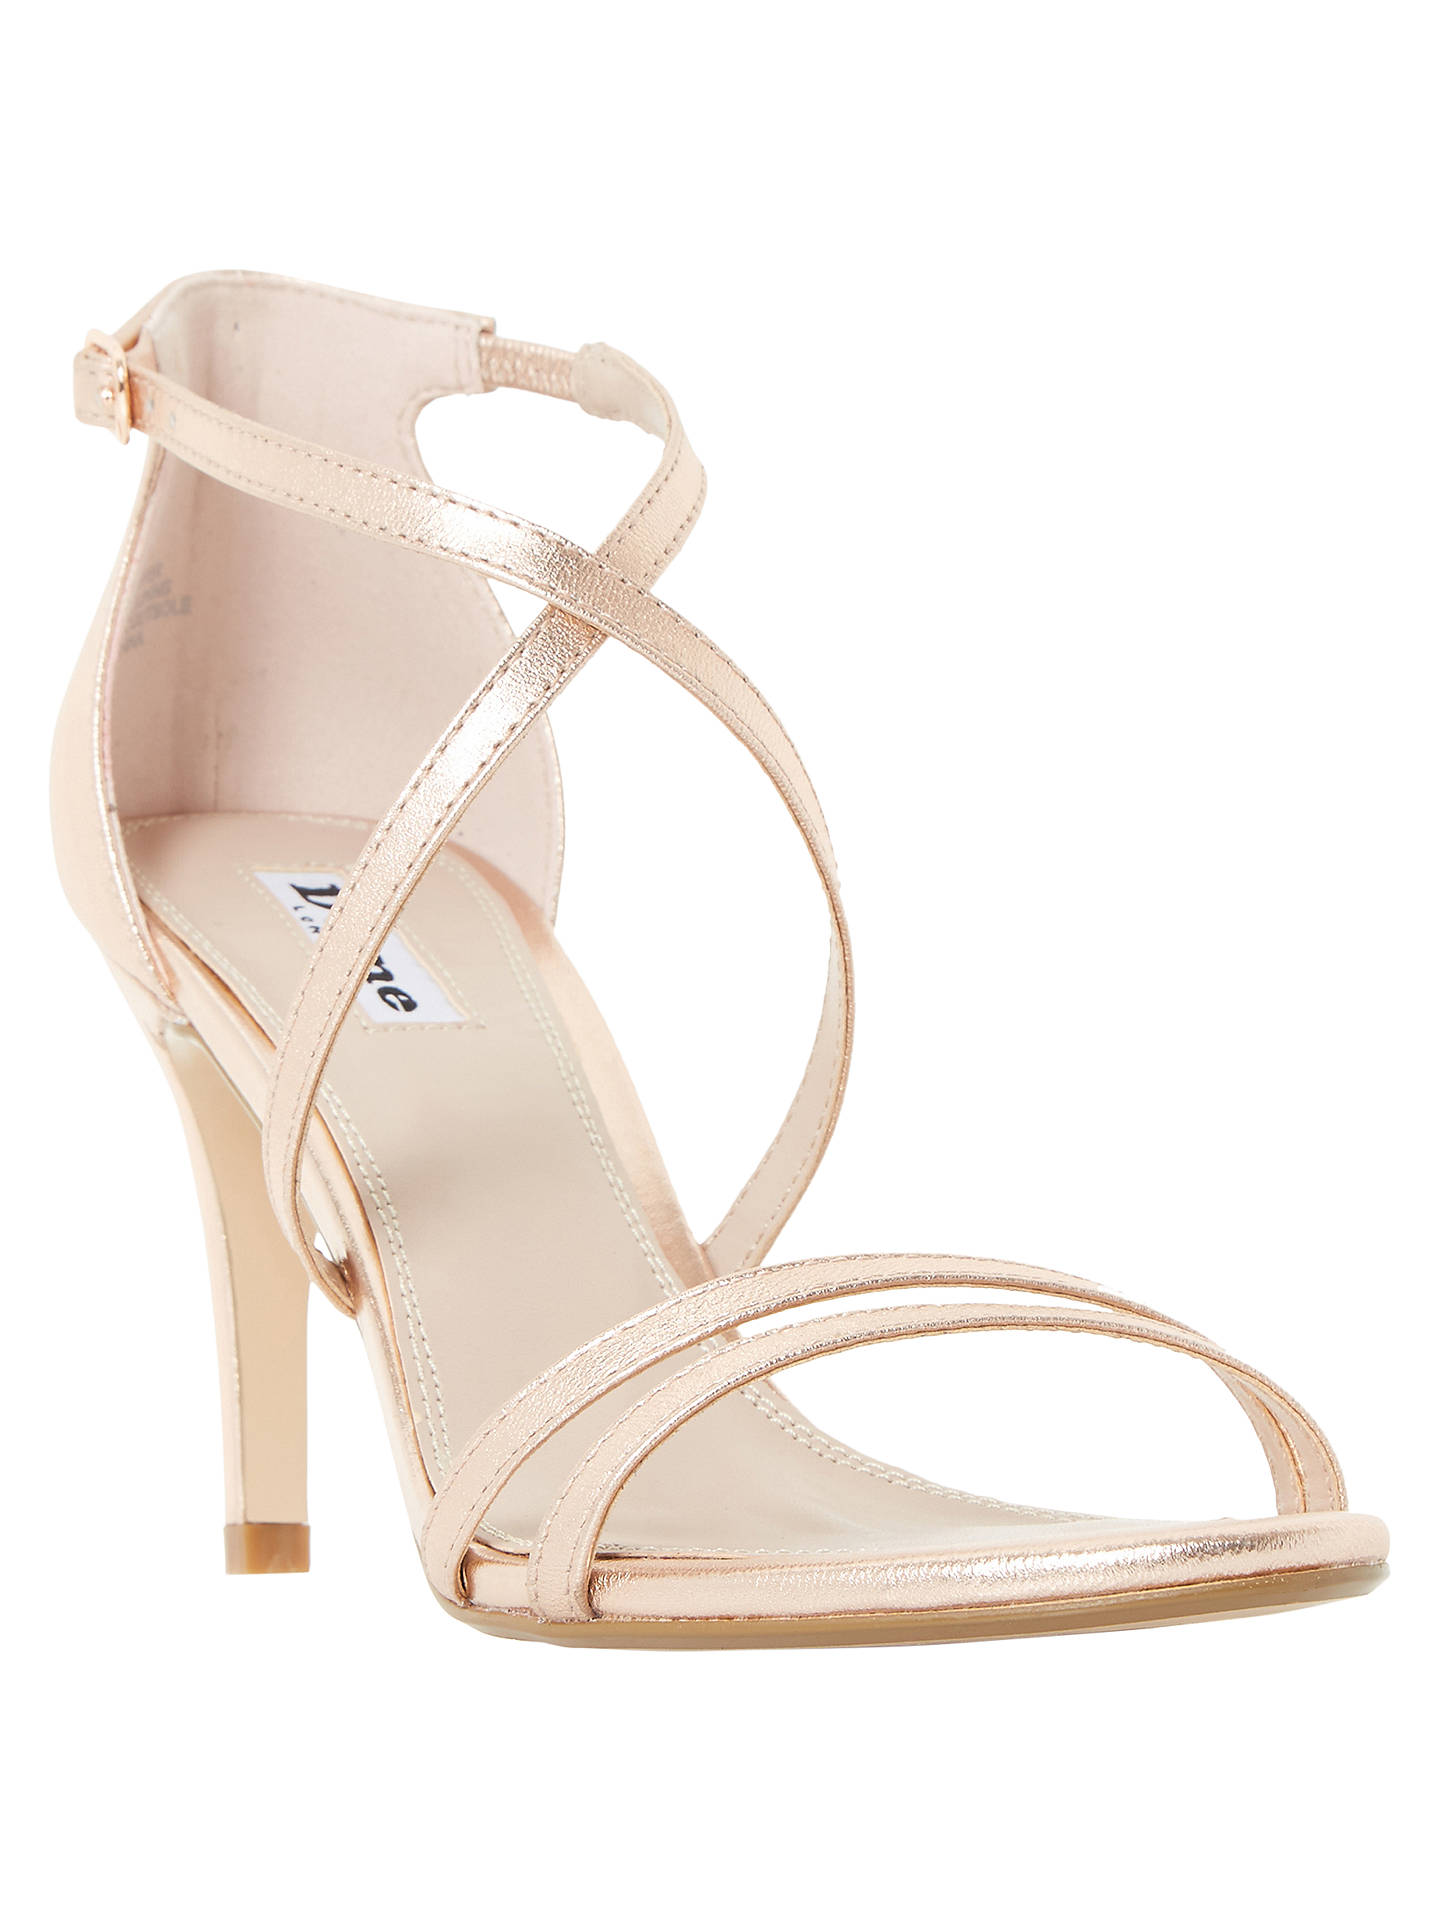 75fd656daf68 Buy Dune Mariela Cross Strap Stiletto Heeled Sandals